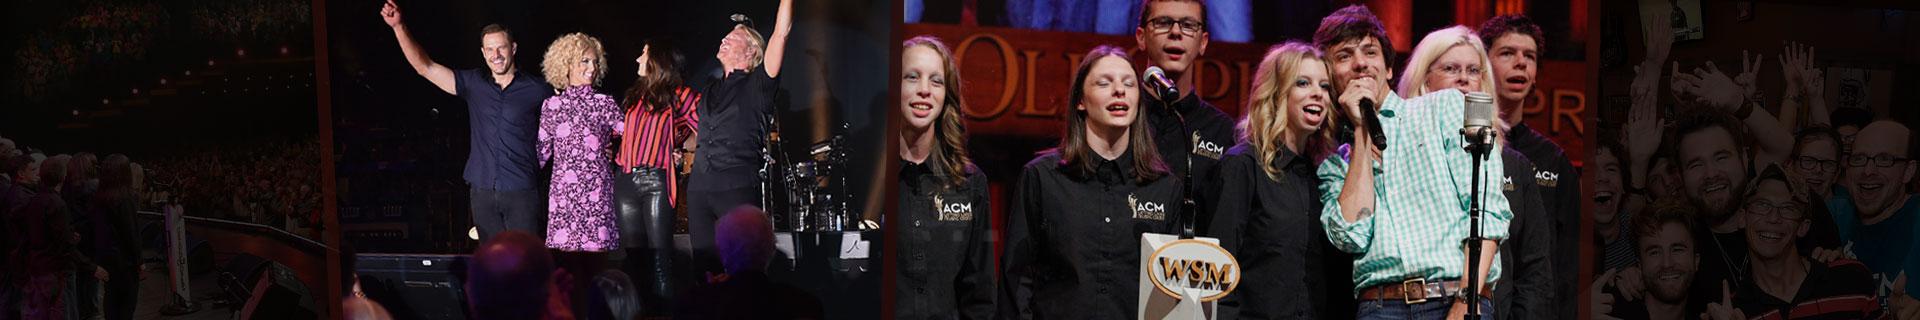 Lifting Lives Music Camp | ACM Lifting Lives